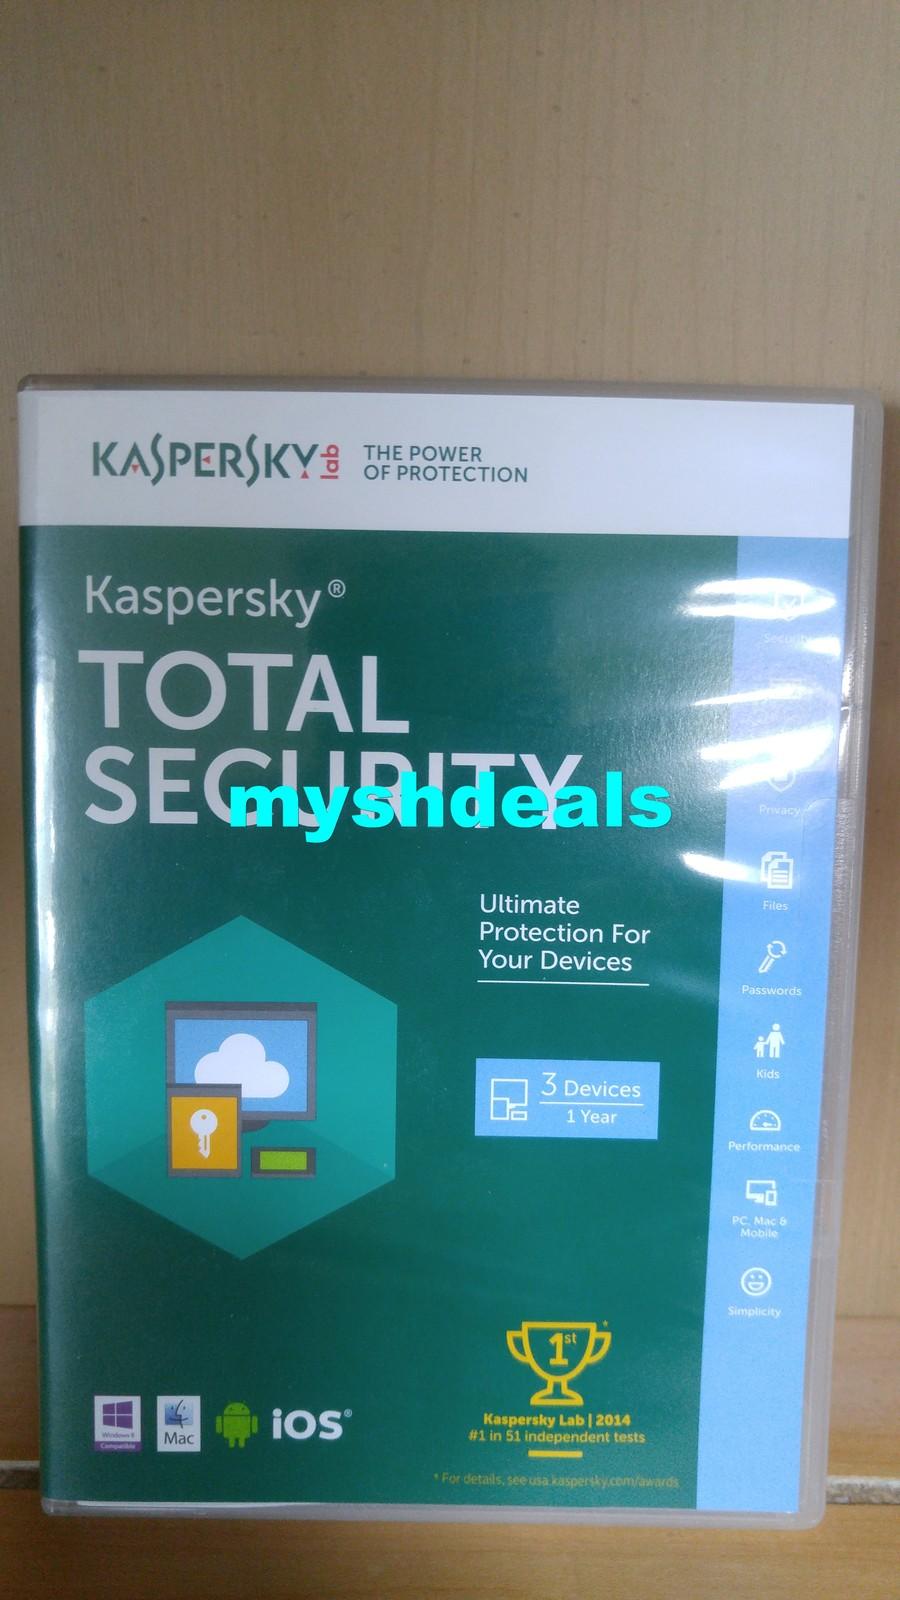 Kaspersky Total Security Review Pc Antivirus Software Internet 4 2 Thn Linkedkaspersky Softwarekaspersky Protection Amp Securitykaspersky 2018